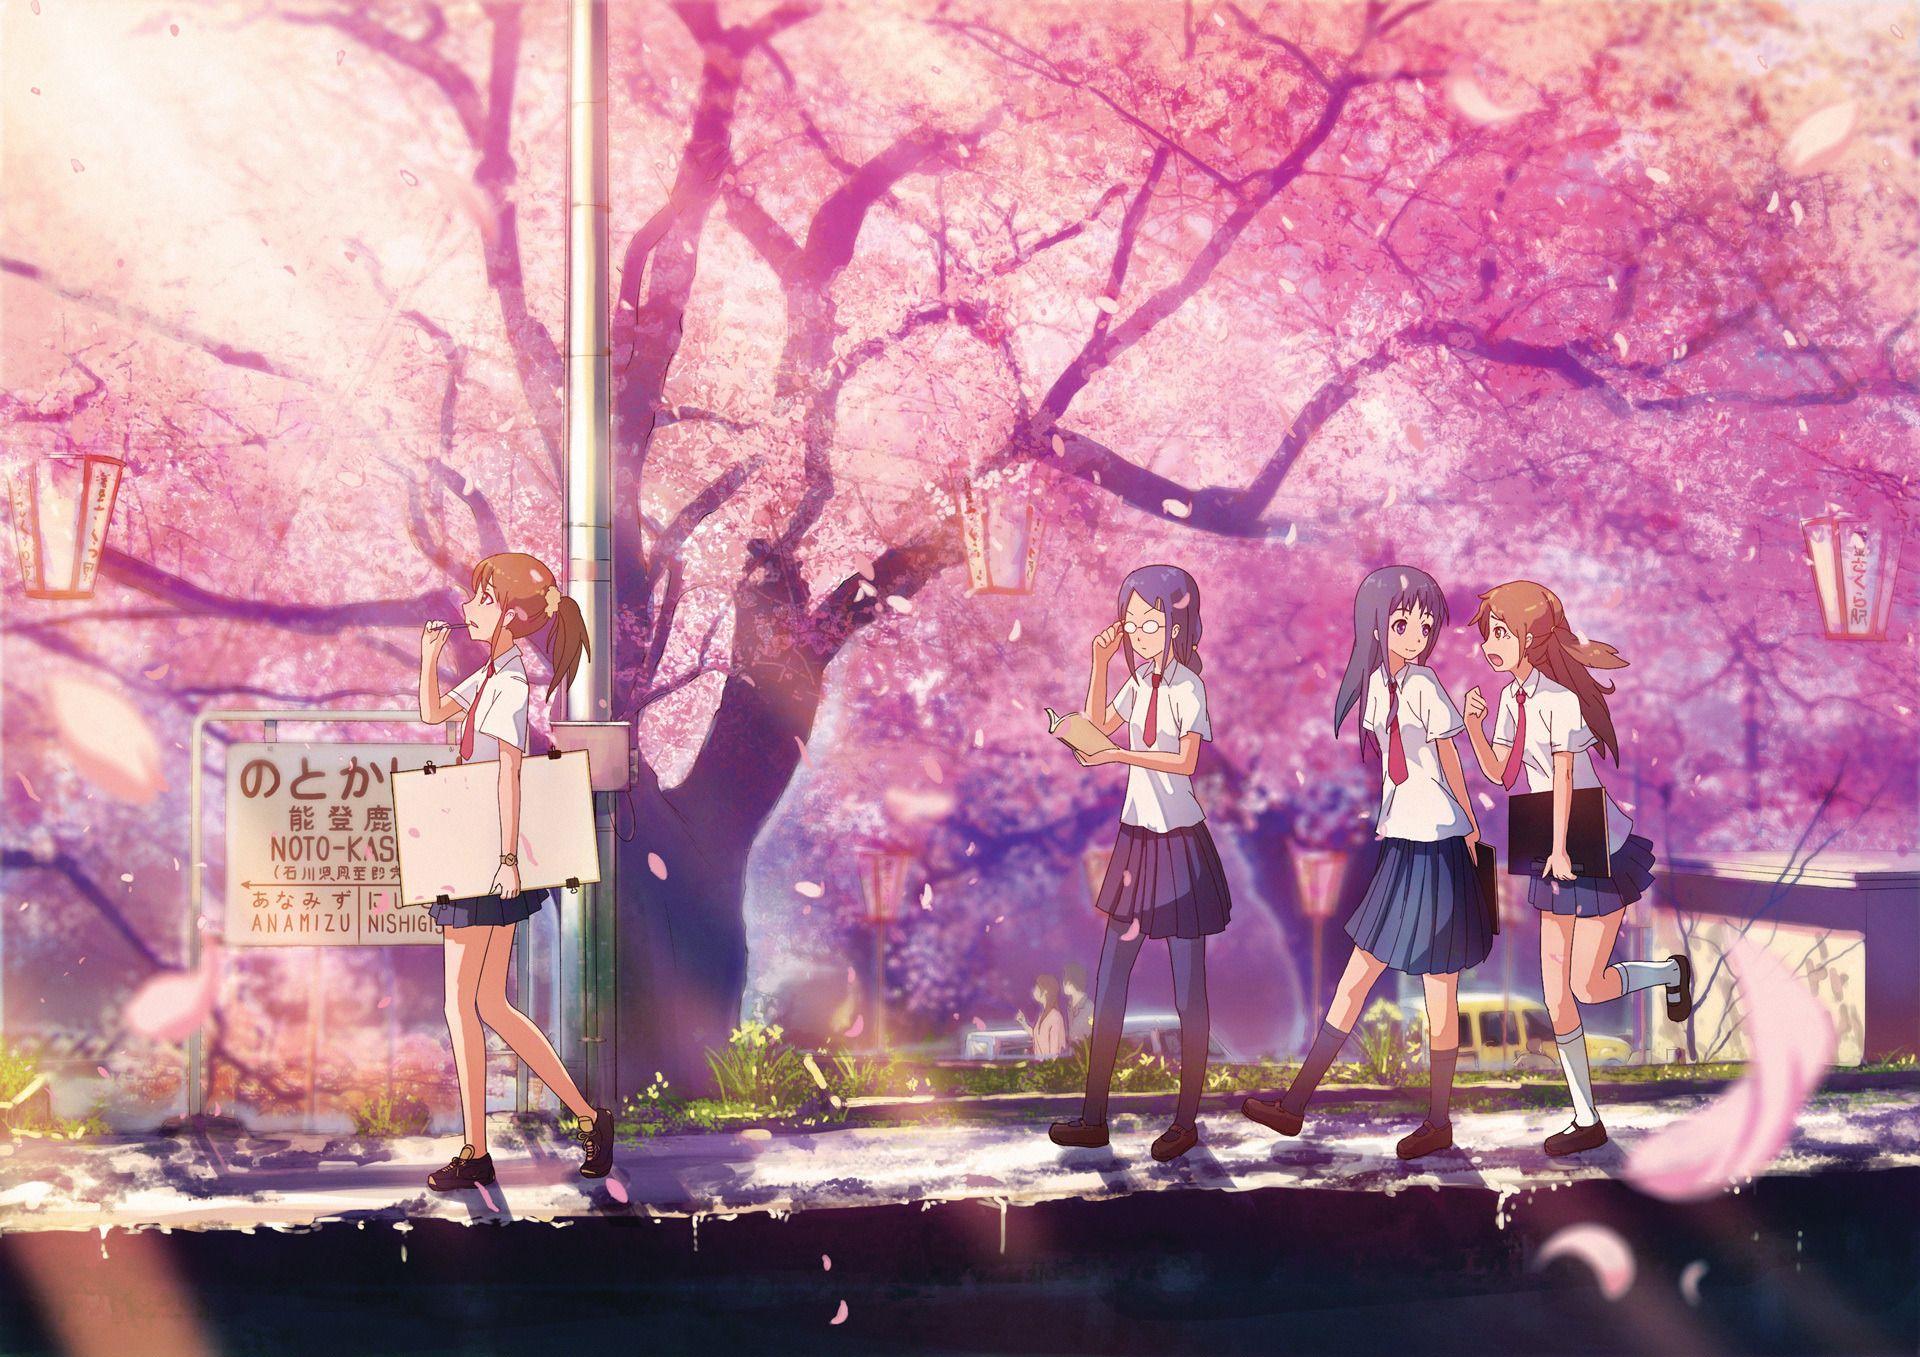 Anime School Girls Walking With Art Supplies Under A Sakura